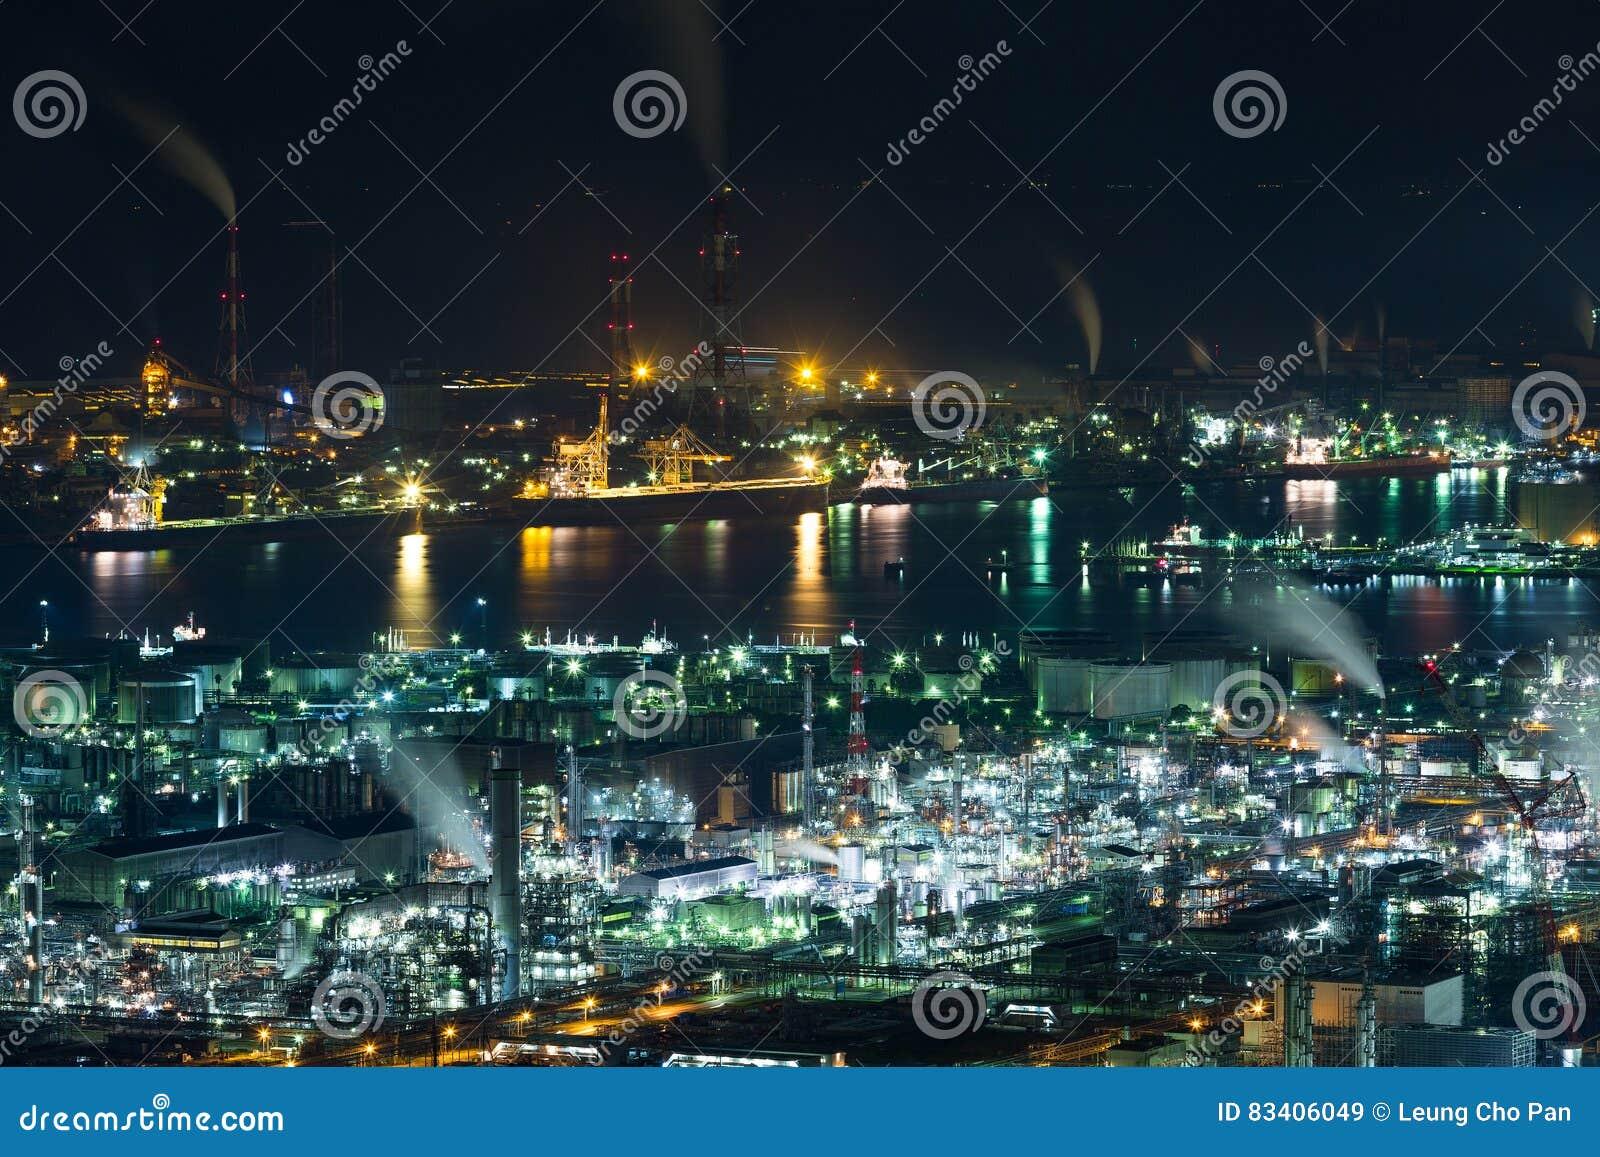 Industry factory in Japan